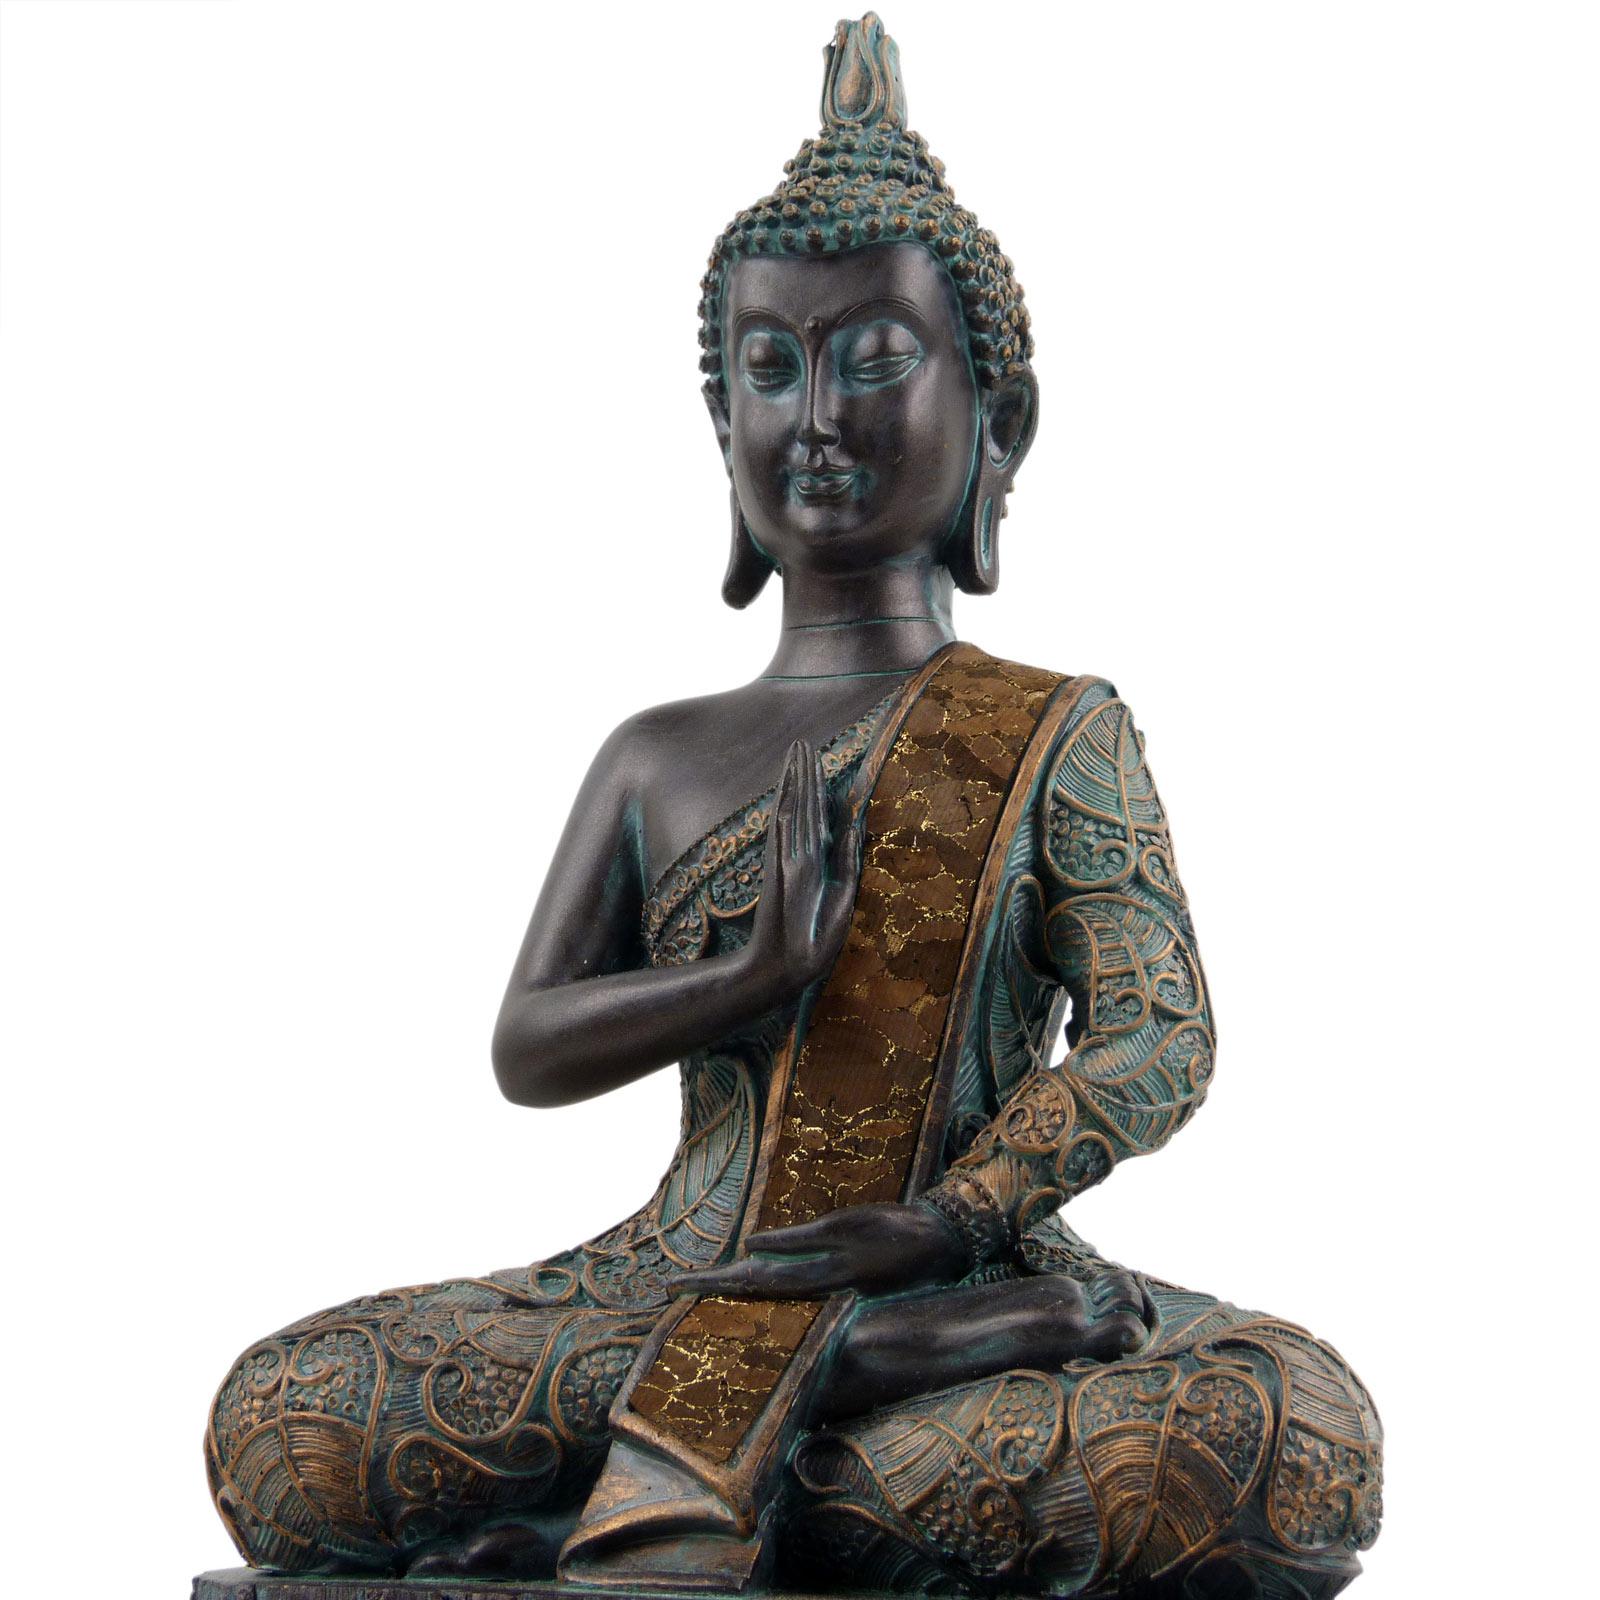 Verdin-Buda-Tailandes-23cm-Alto-4-Disenos-Meditacion-Mindfulness-Metta miniatura 8